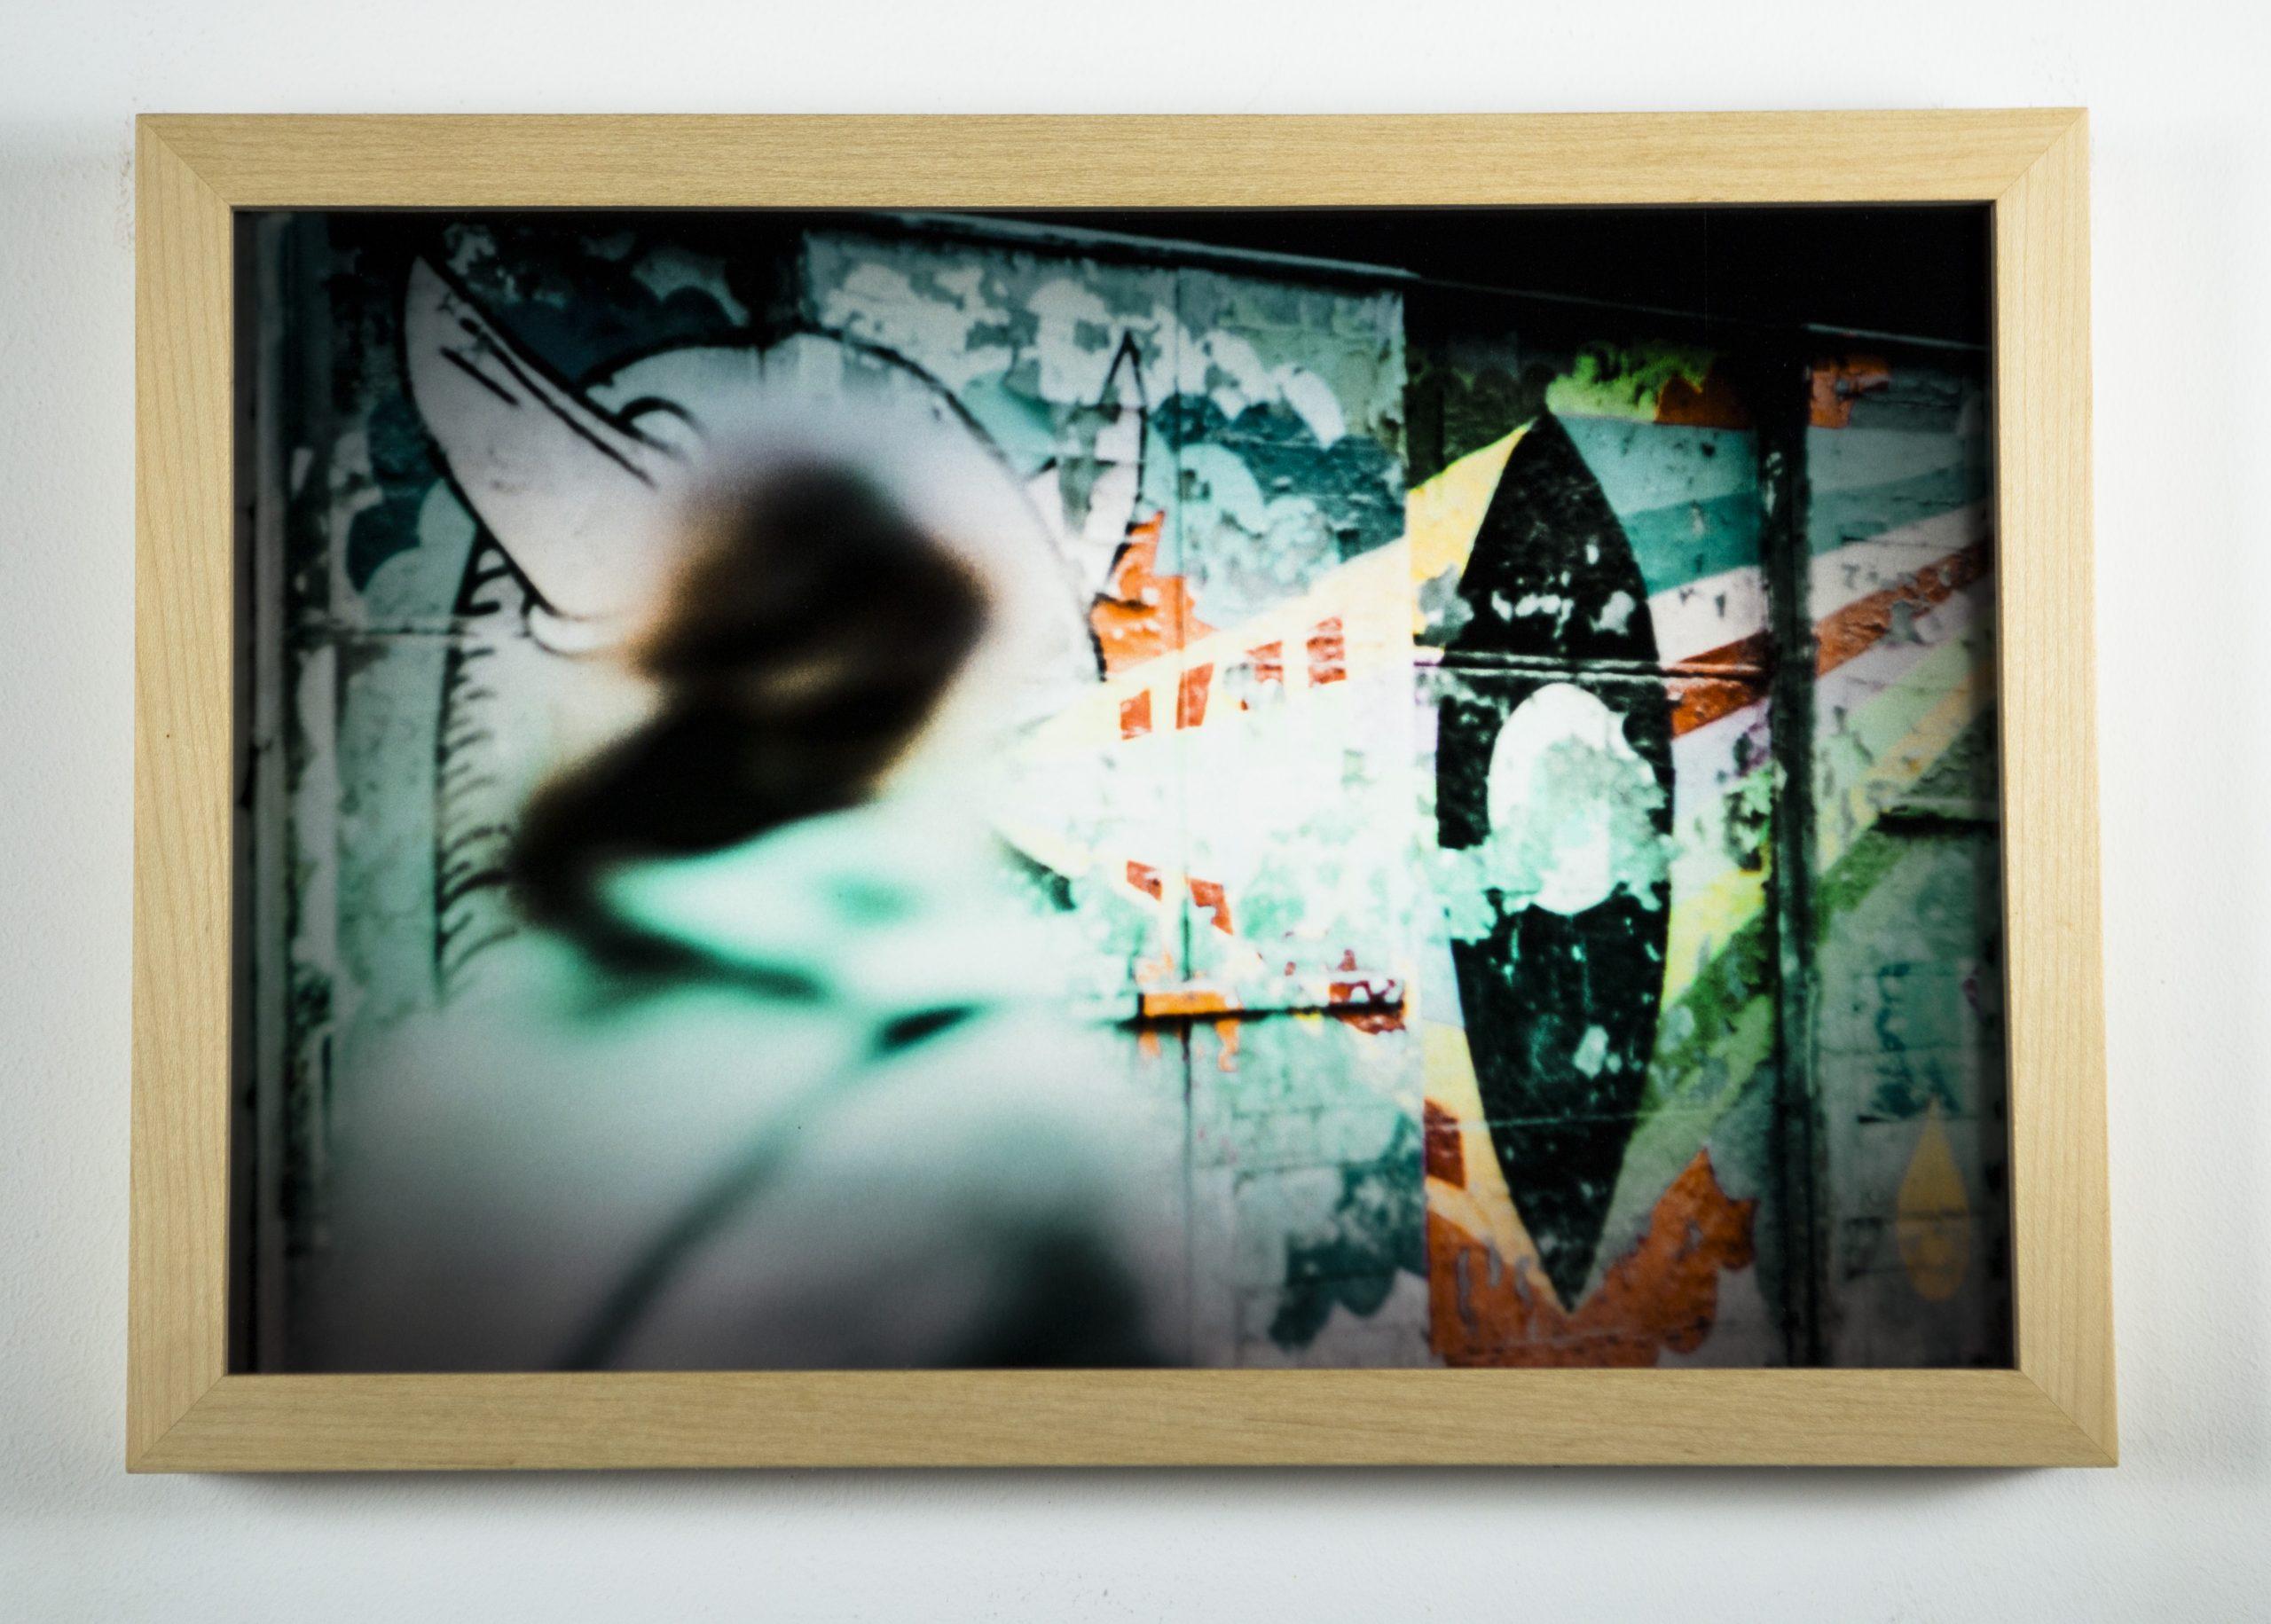 """The Cosmic Soul"". 39 x 26cm. Fotografía Digital. Canson Infinity Baryta Prestige 340grm."